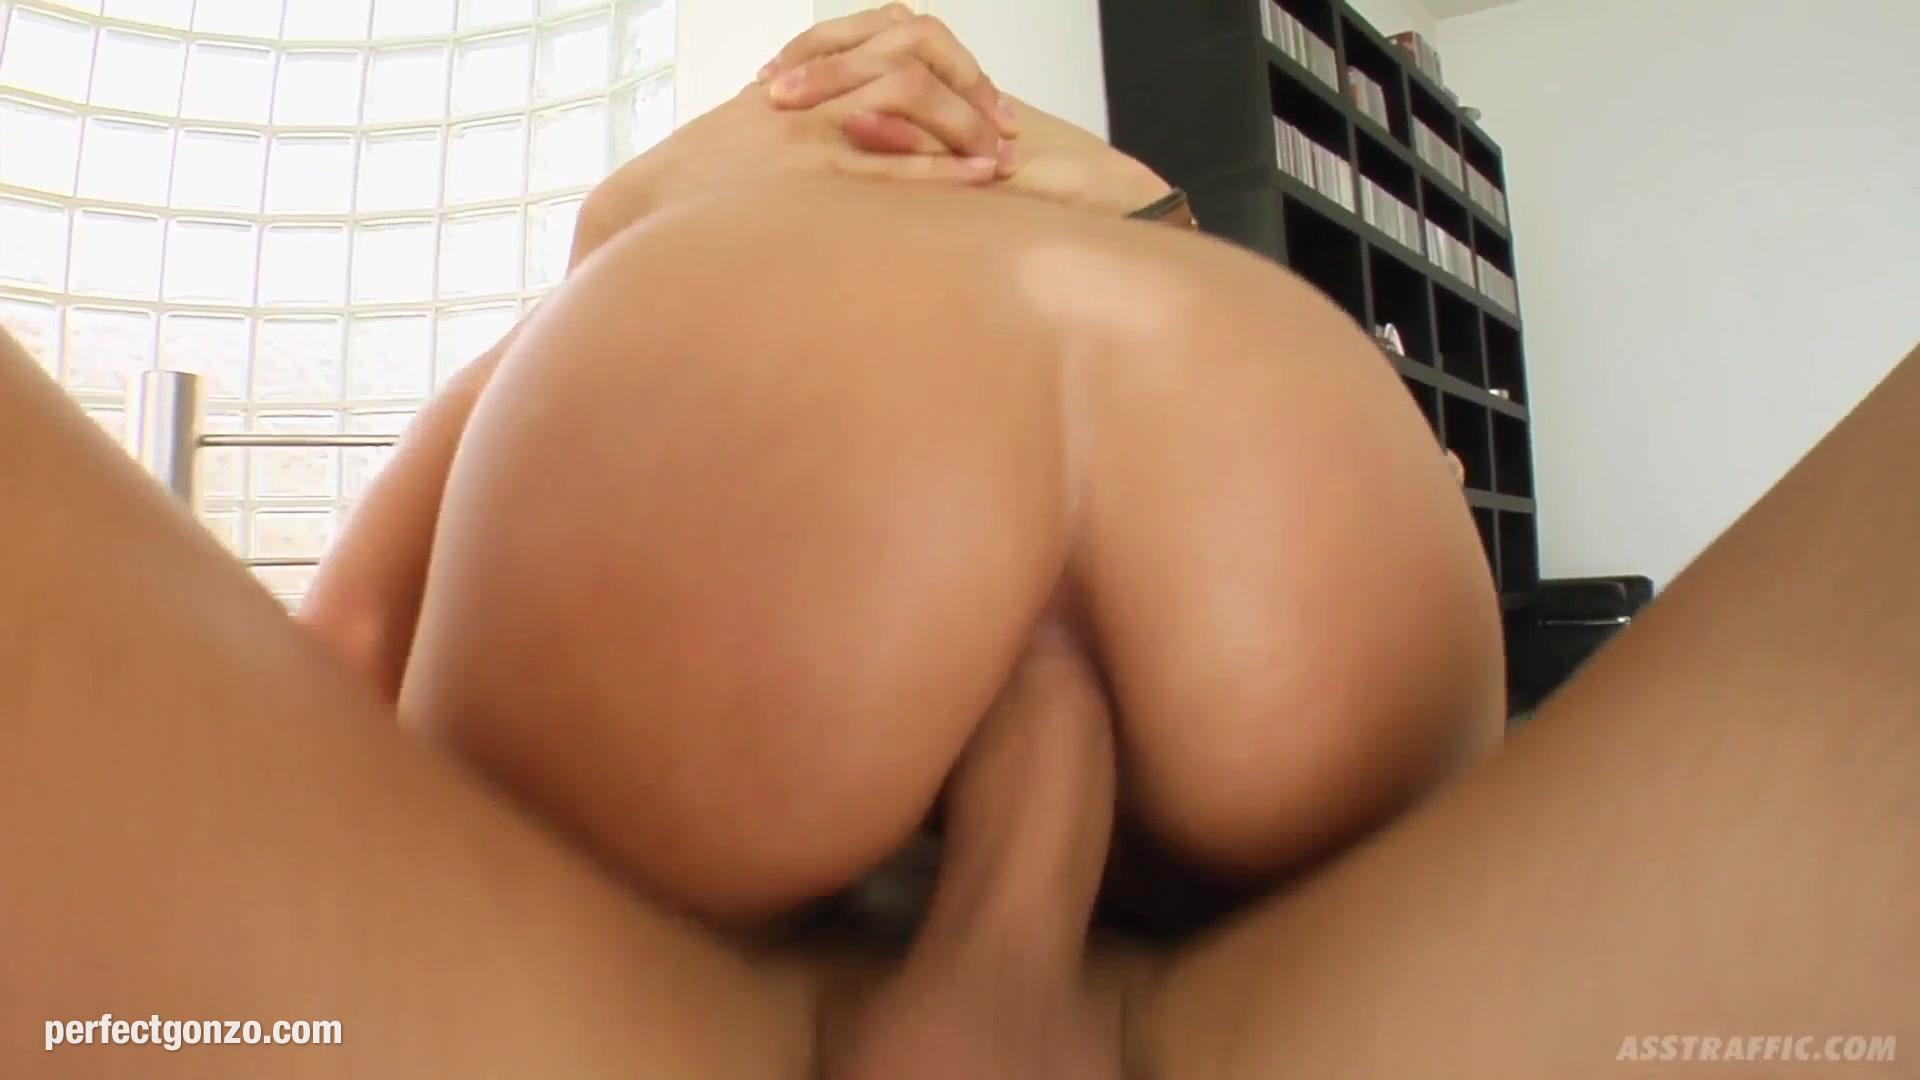 All porn pics Site rencontre gratuit musulman